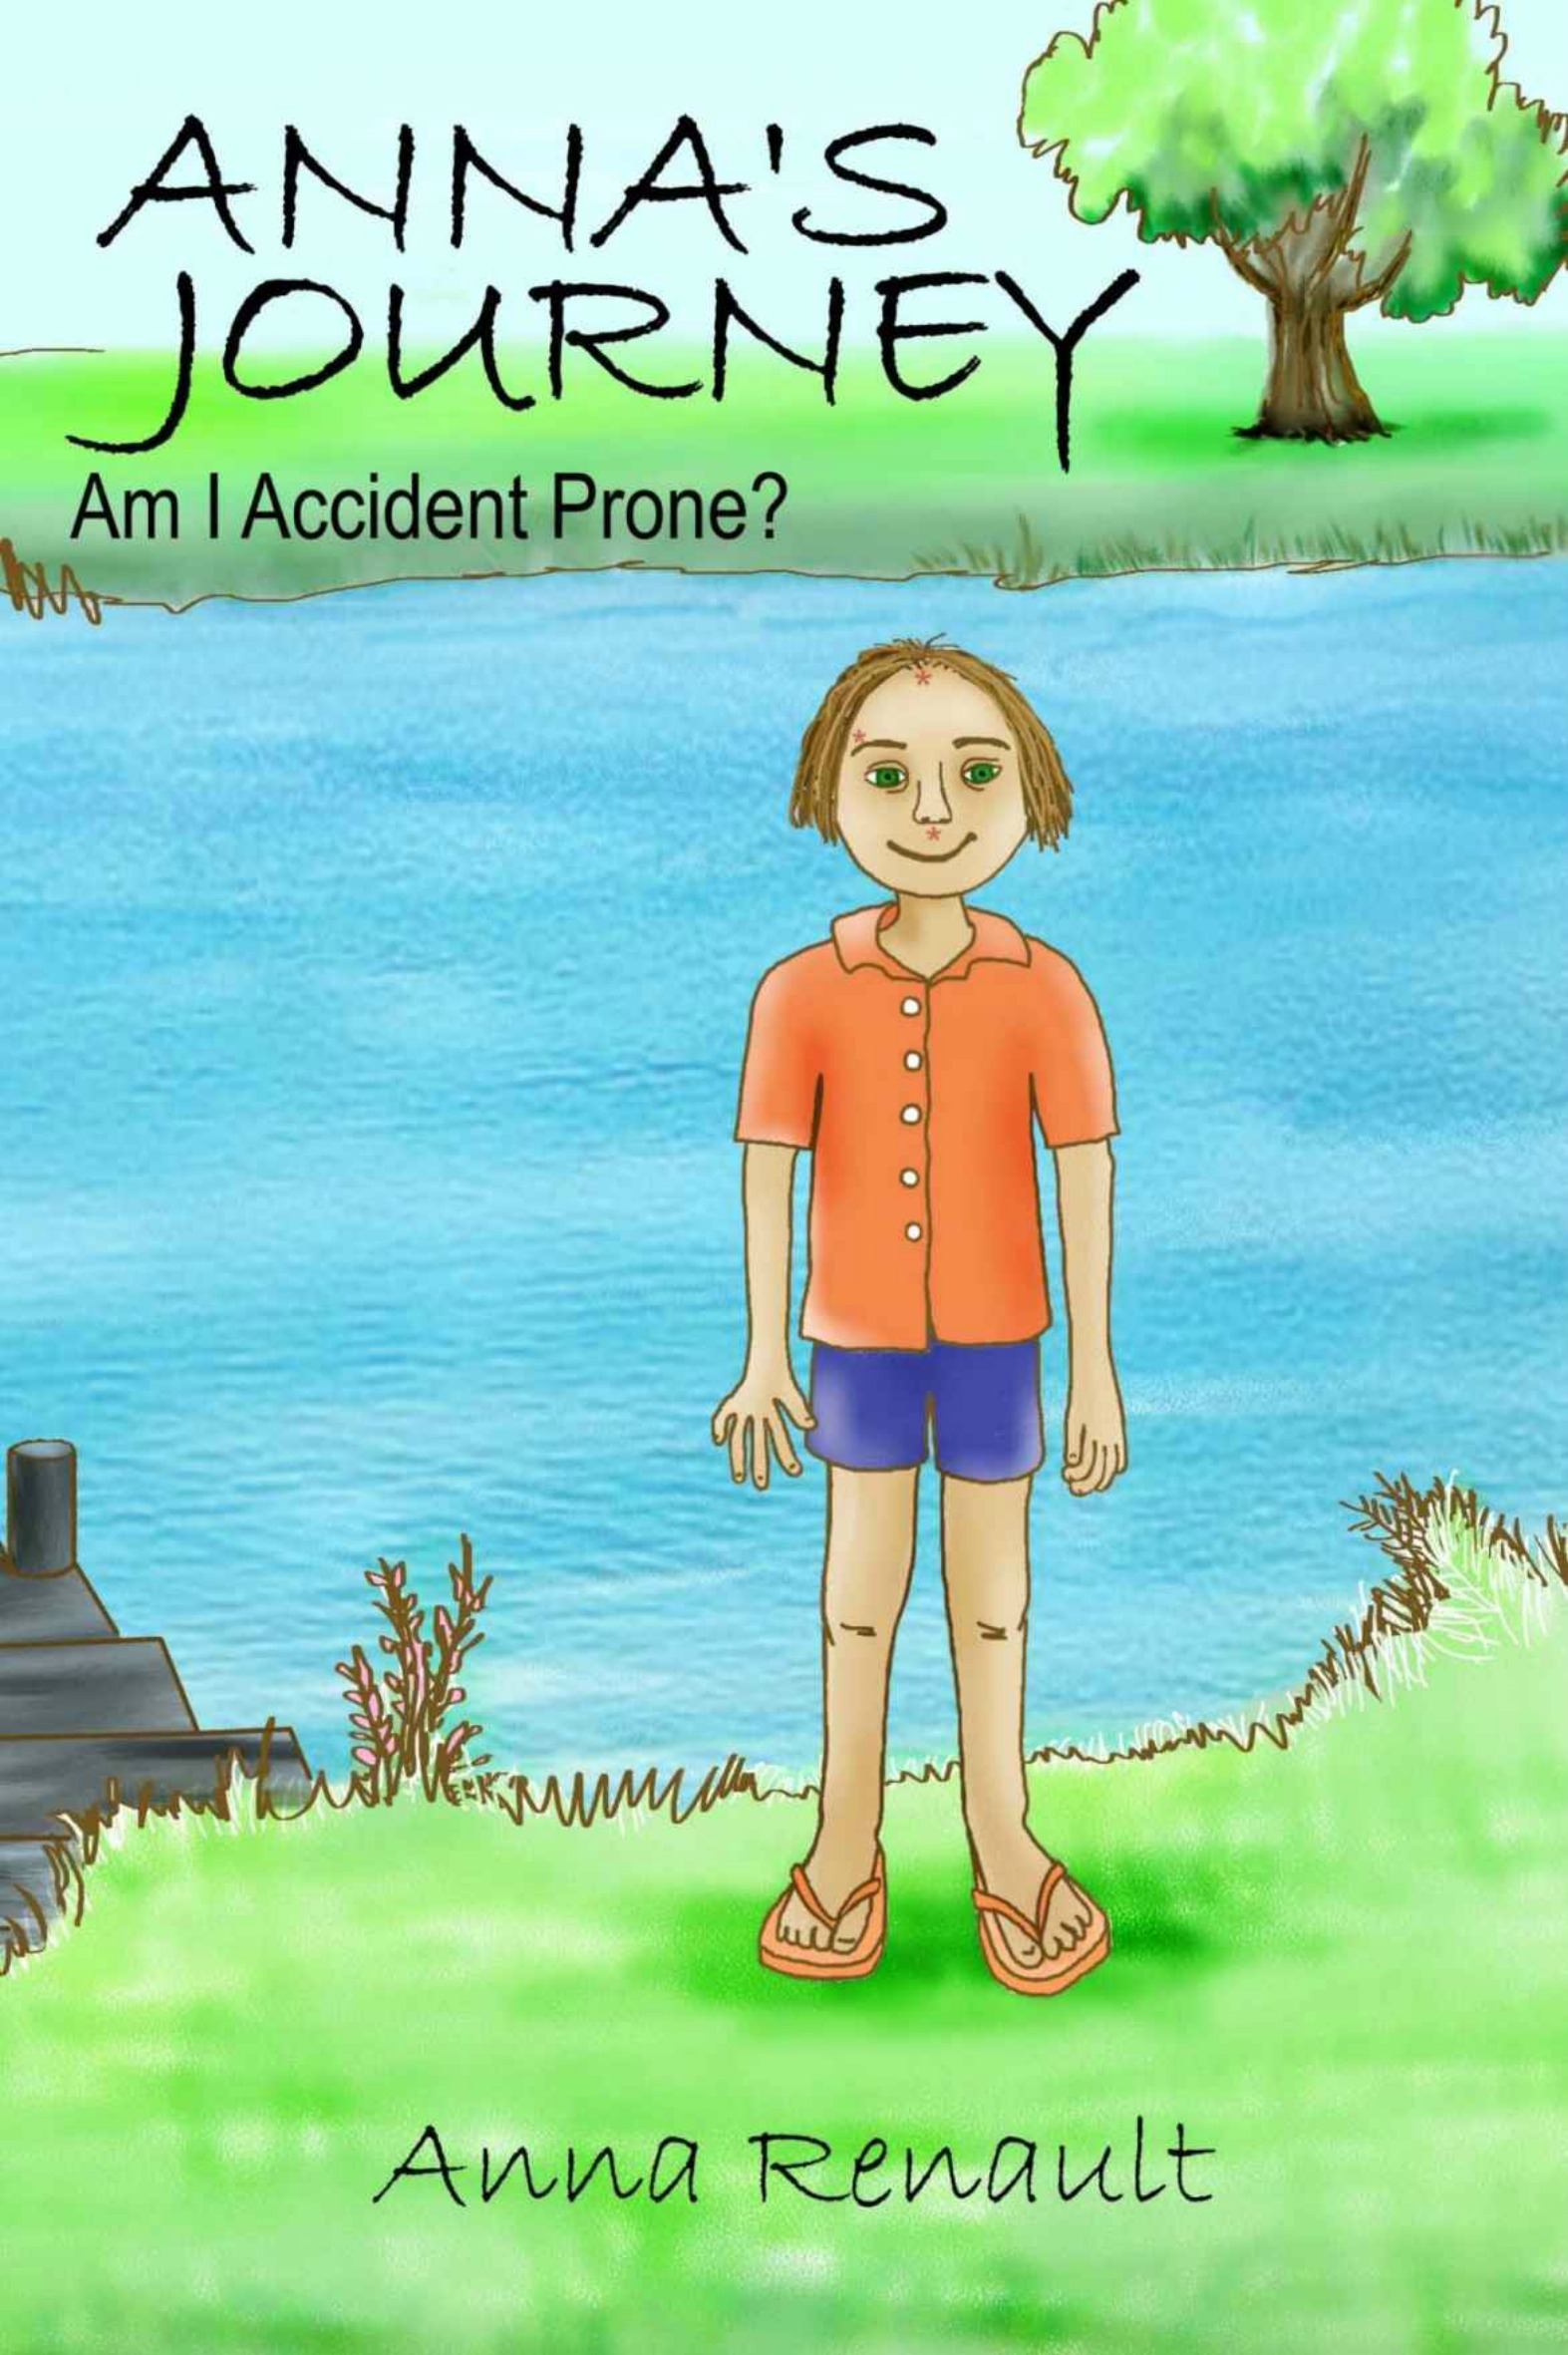 Anna's Journey: Am I Accident Prone?